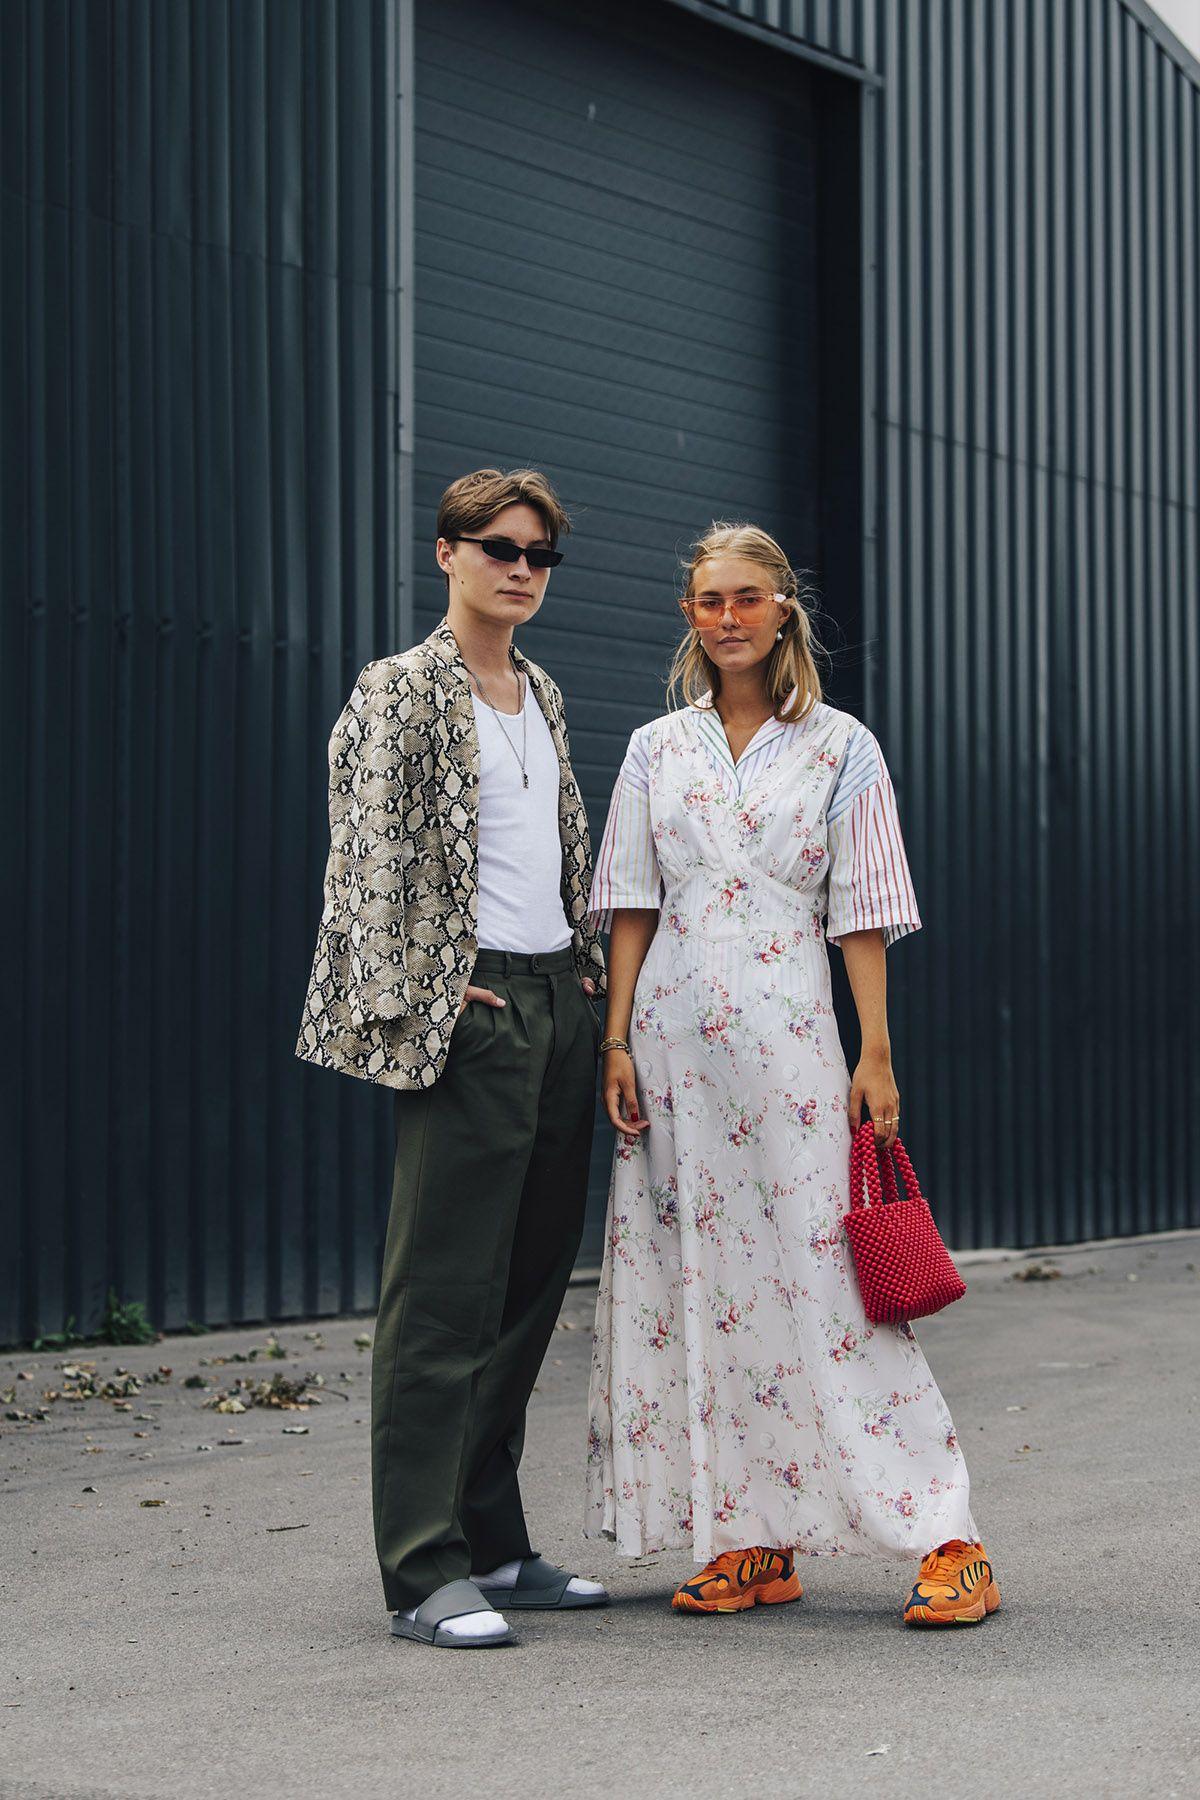 Pin by Kennah Morgan on fashion   Fashion, Cool street ...